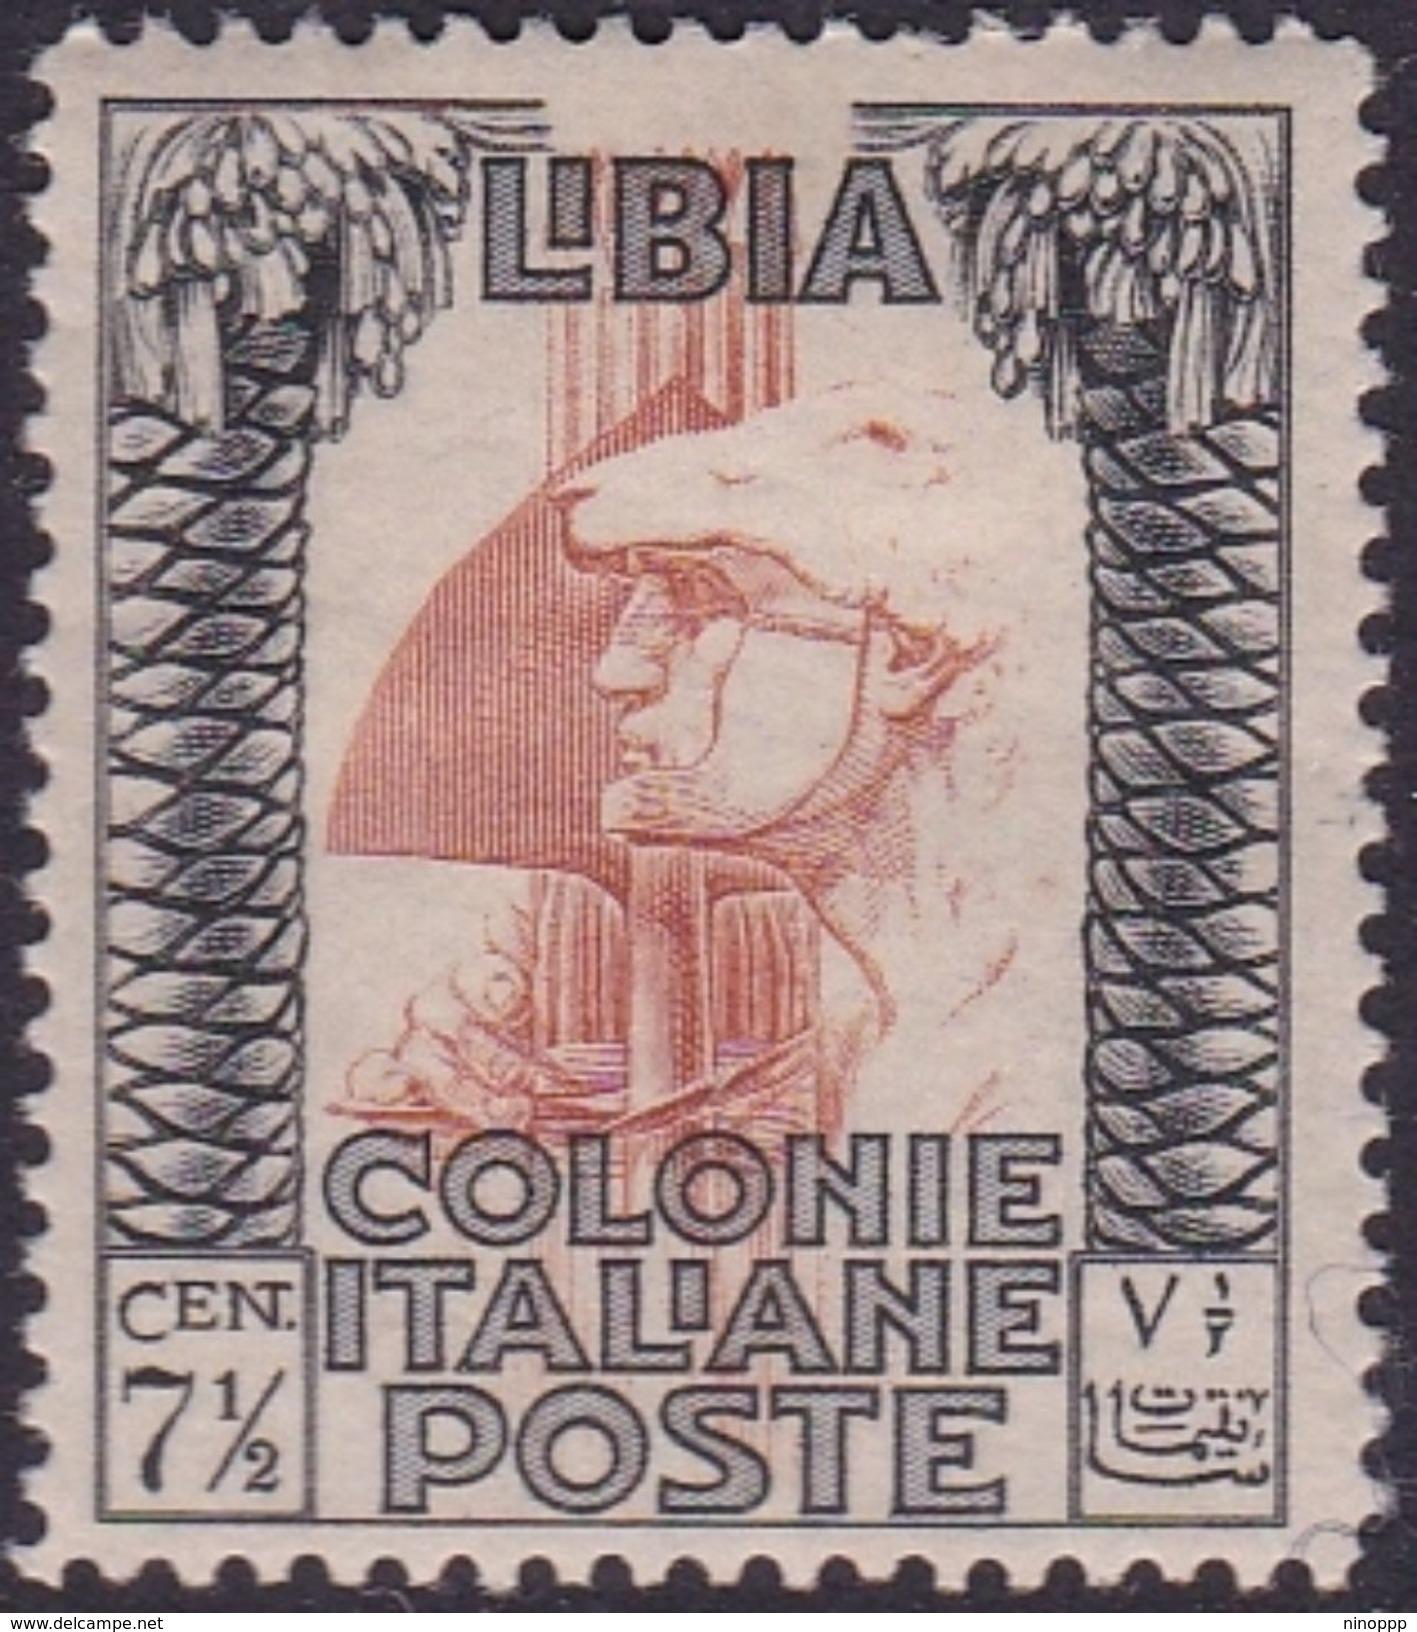 Italy-Colonies And Territories-Libya S 103 1931 Roman Legionary 7,5 C Perf 14,Mint Hinged - Libya